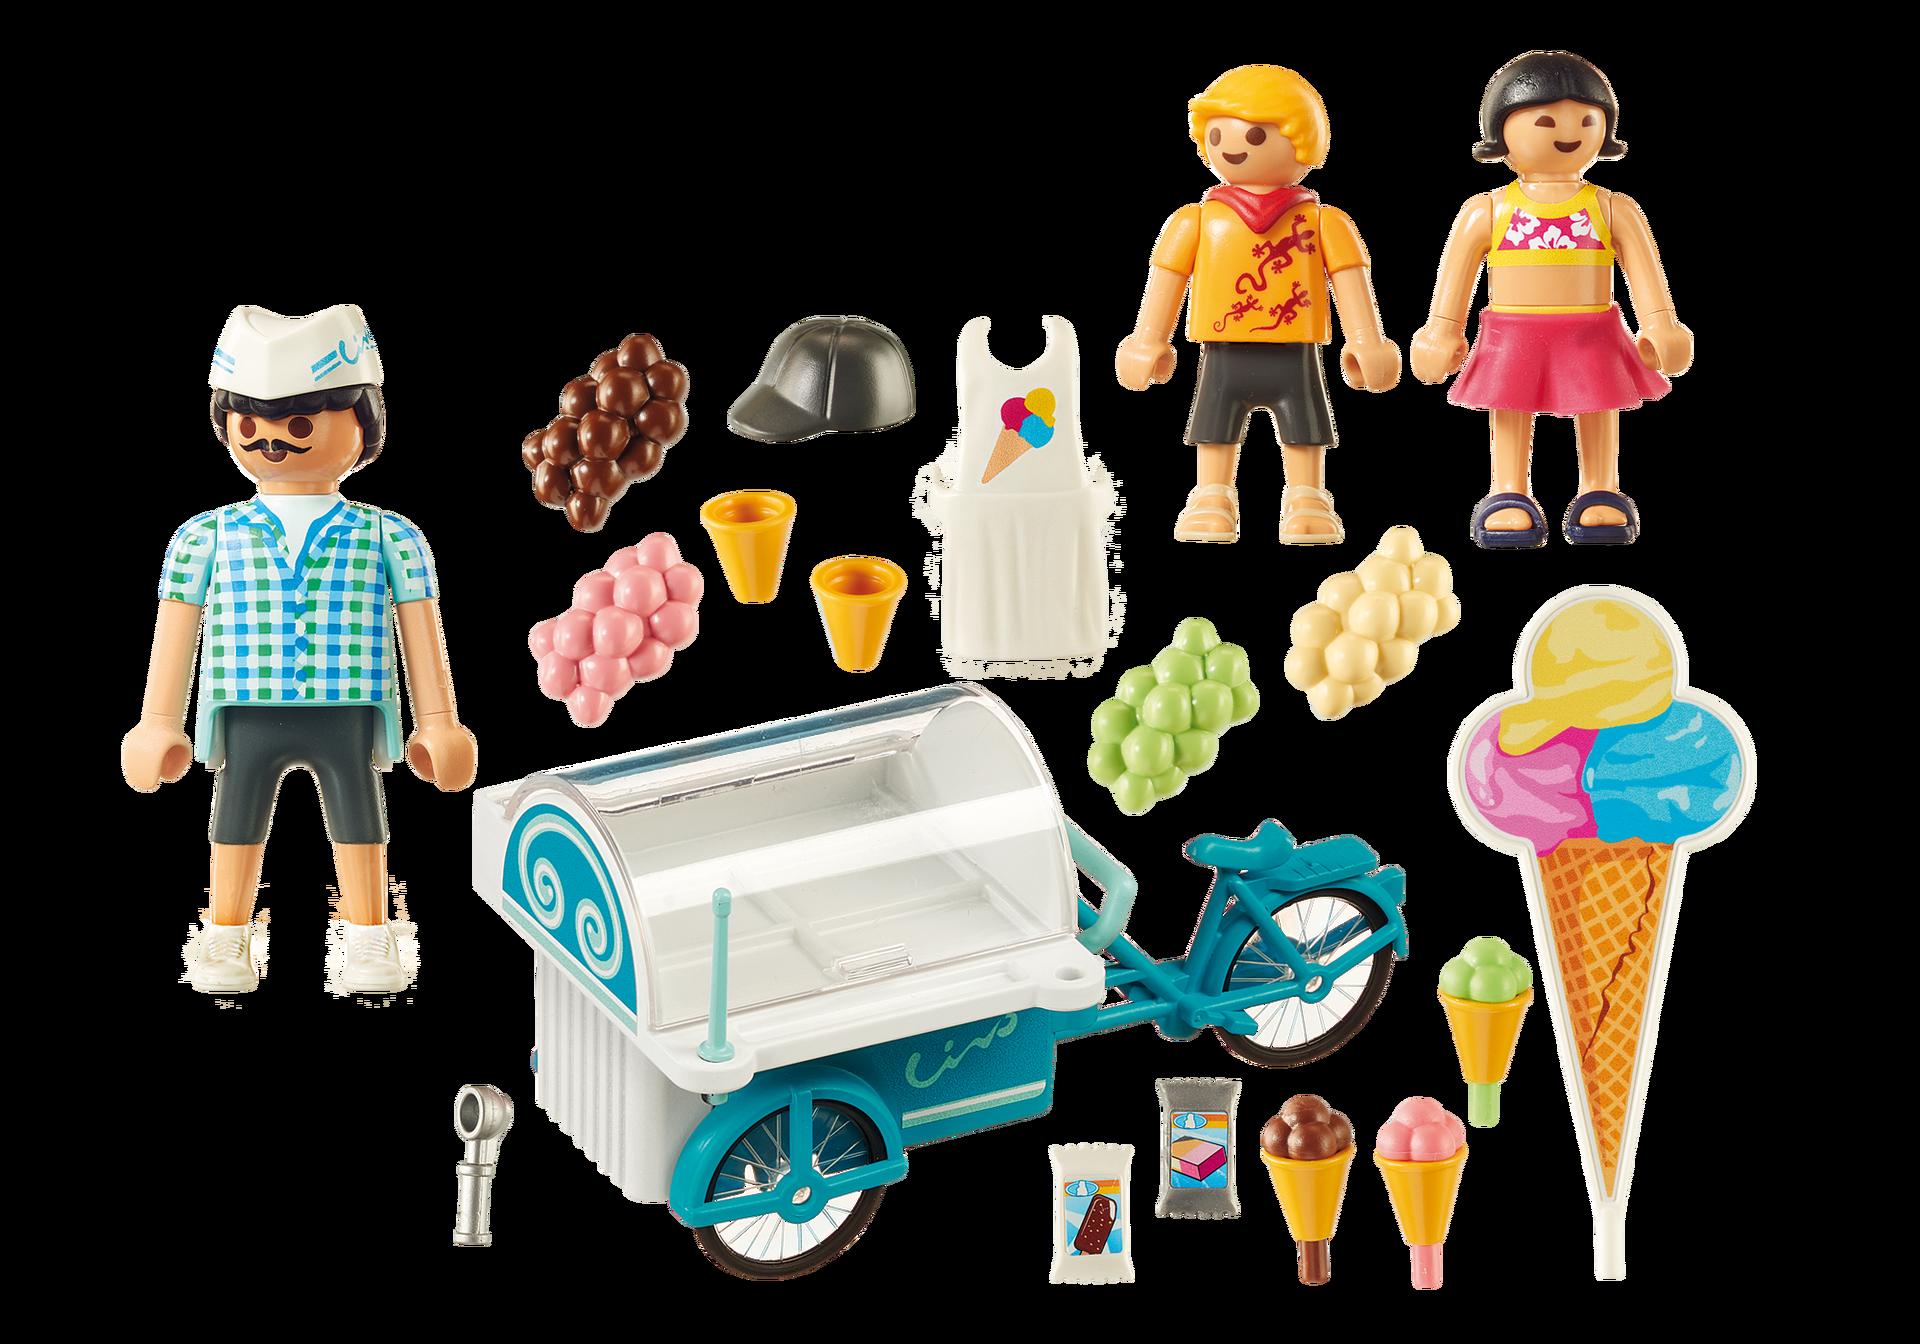 Icecream clipart cart. Ice cream playmobil httpmediaplaymobilcomiplaymobilproductboxback